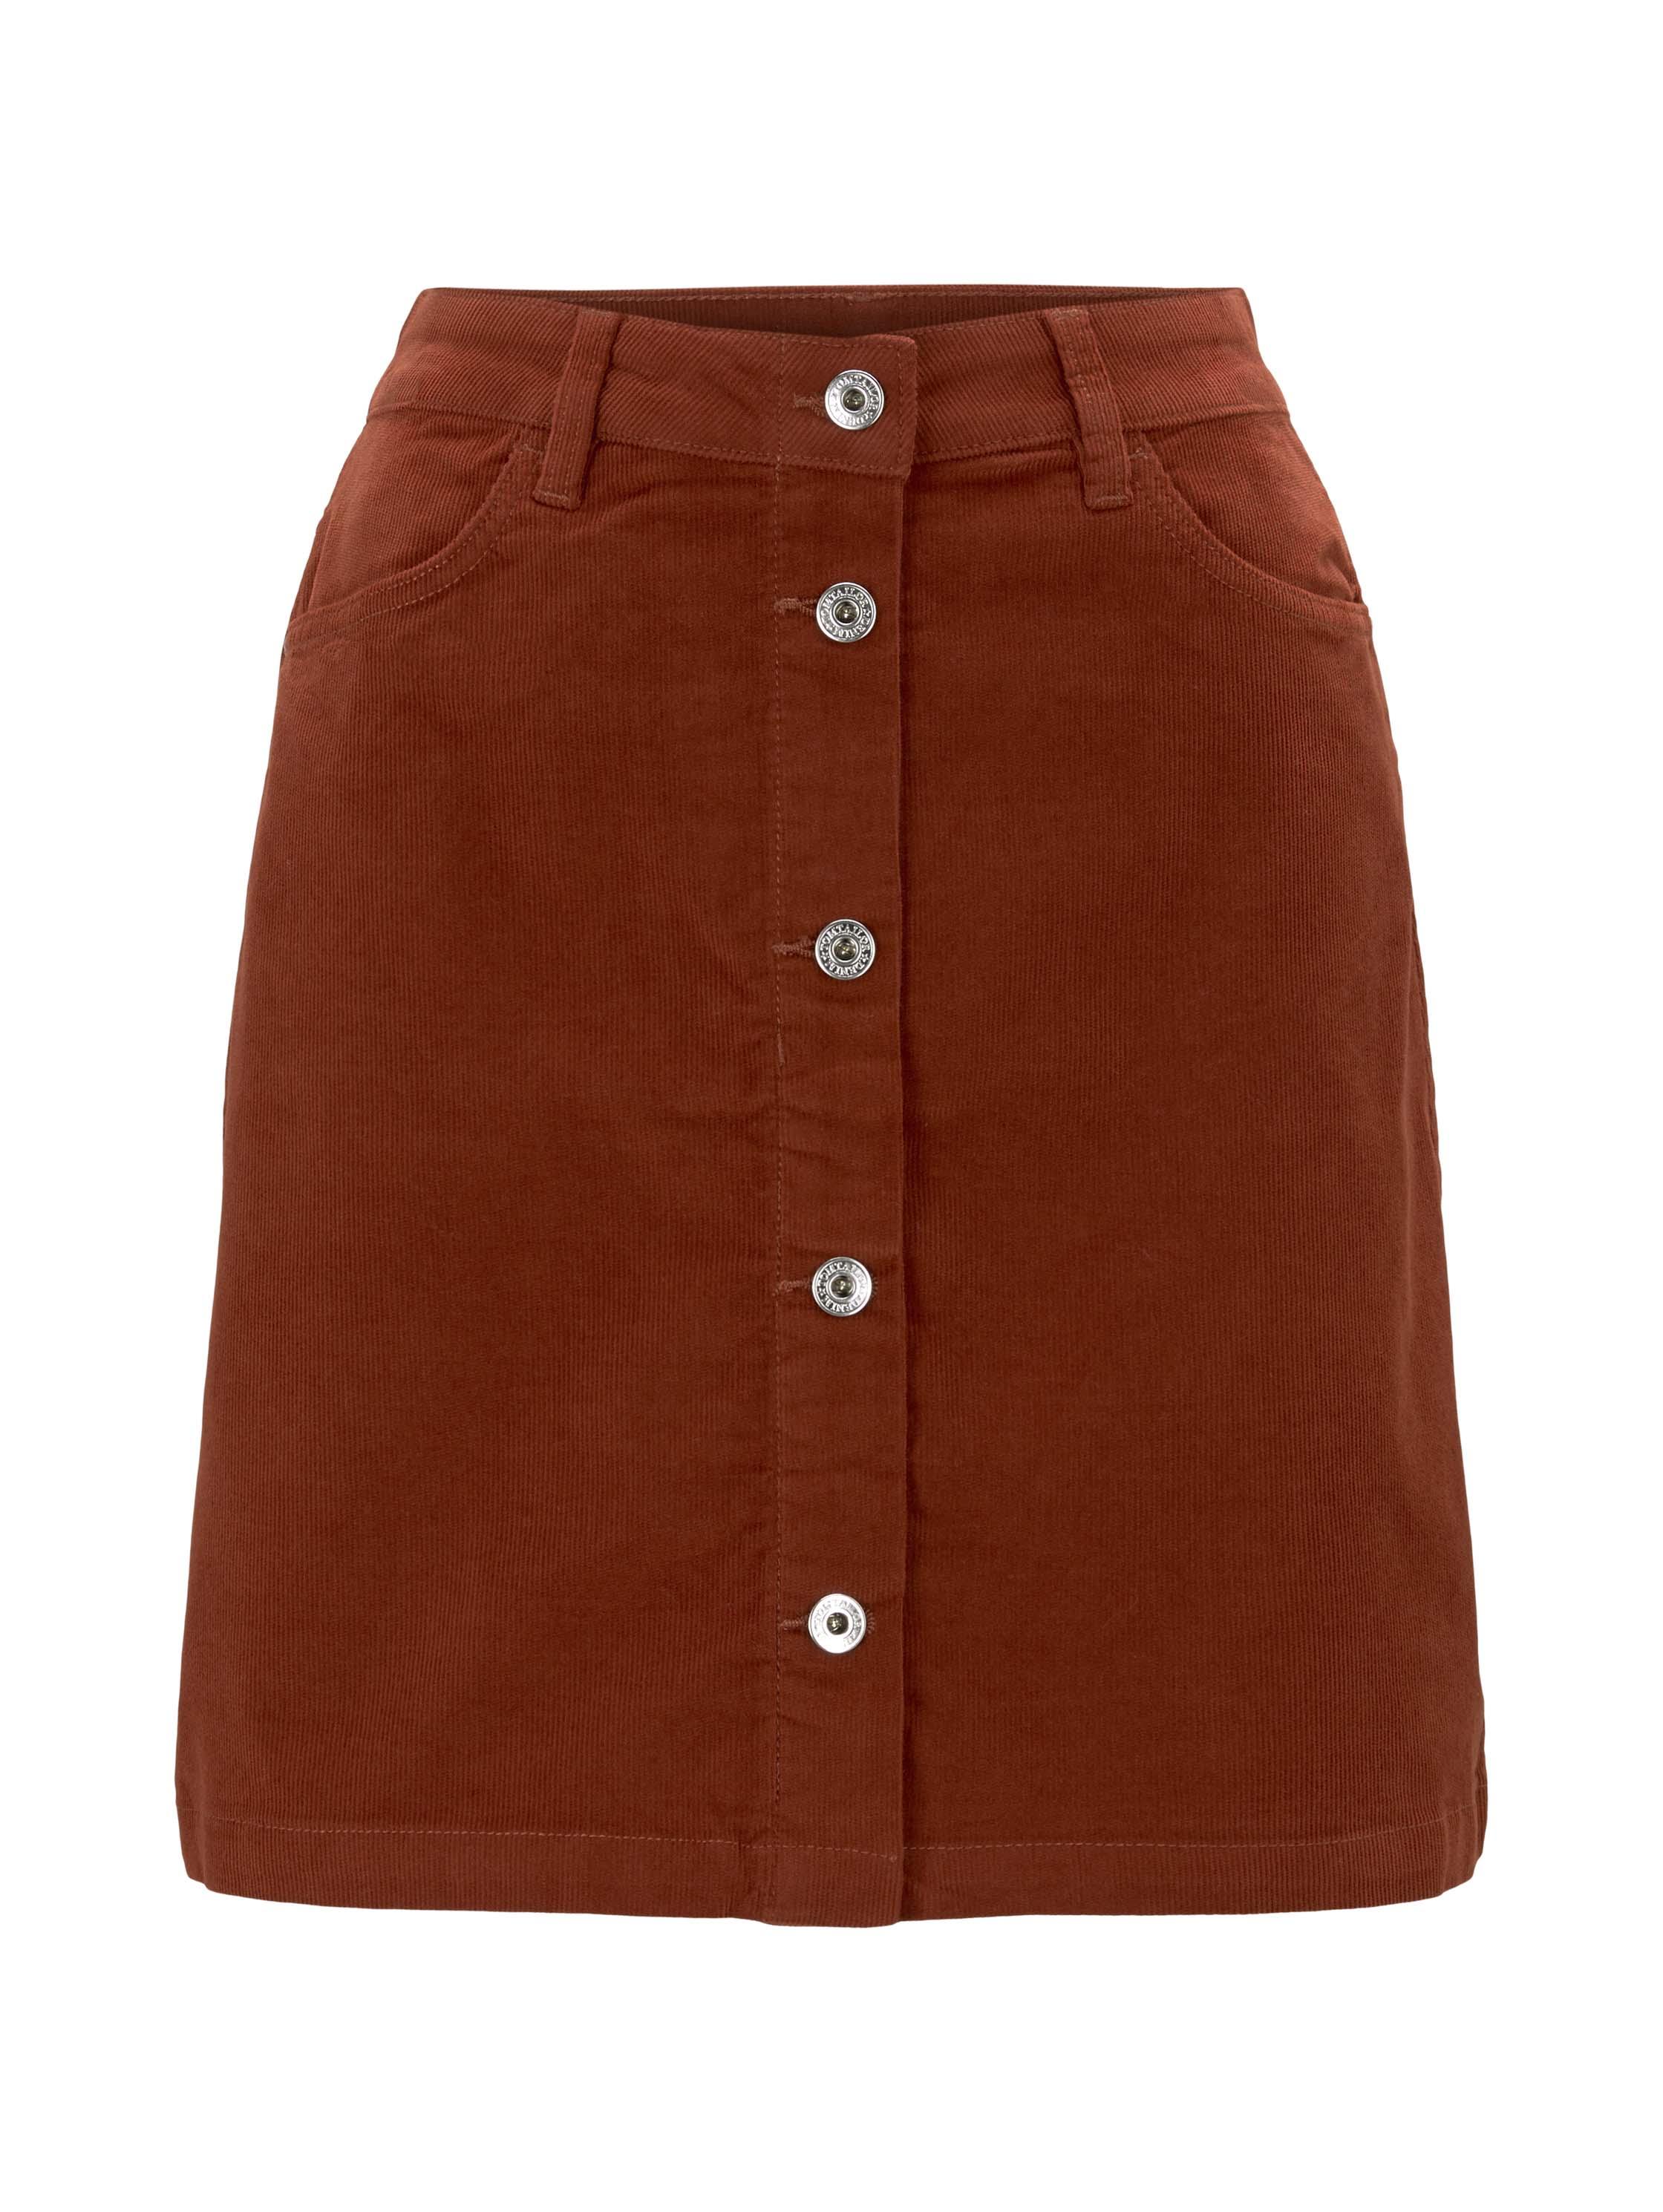 corduroy mini skirt, Rust Orange